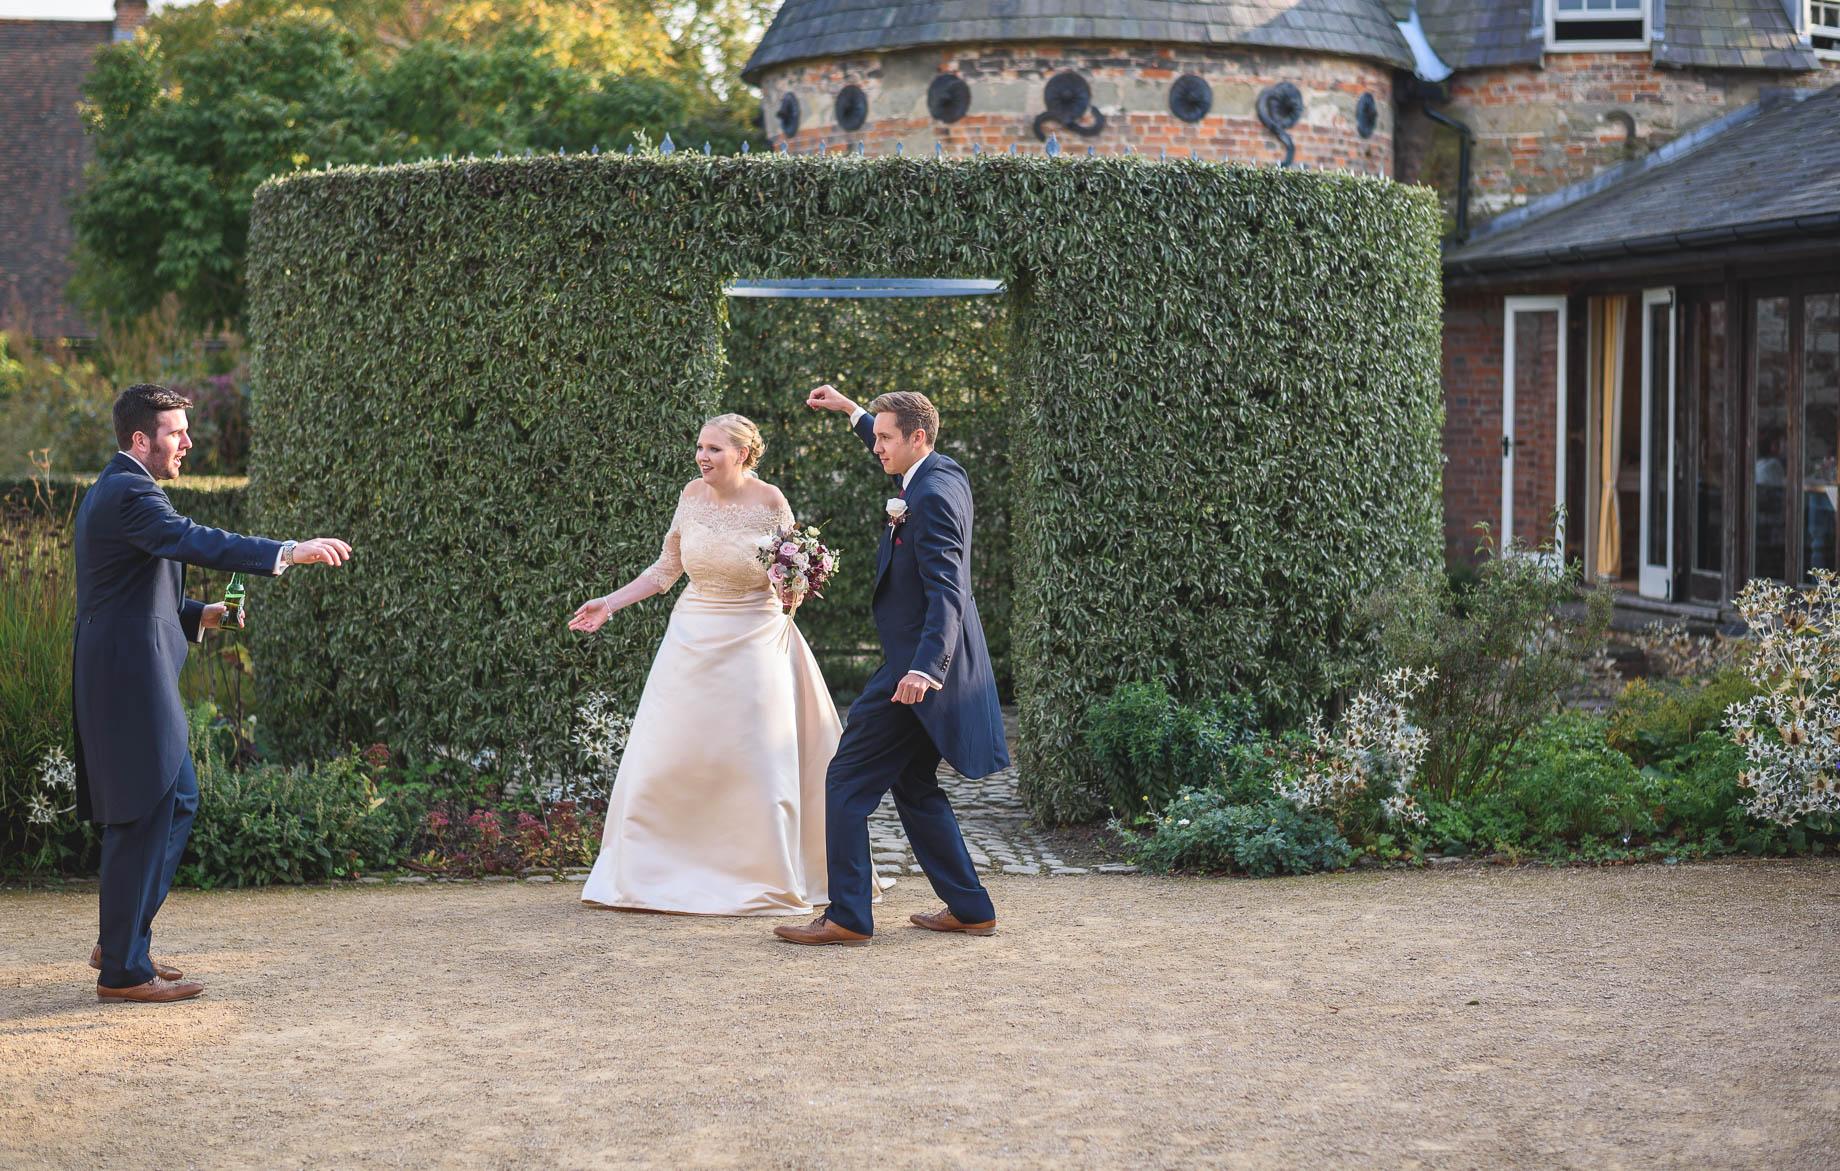 Bury Court Barn wedding photography - Guy Collier - Hannah and Mark (134 of 191)